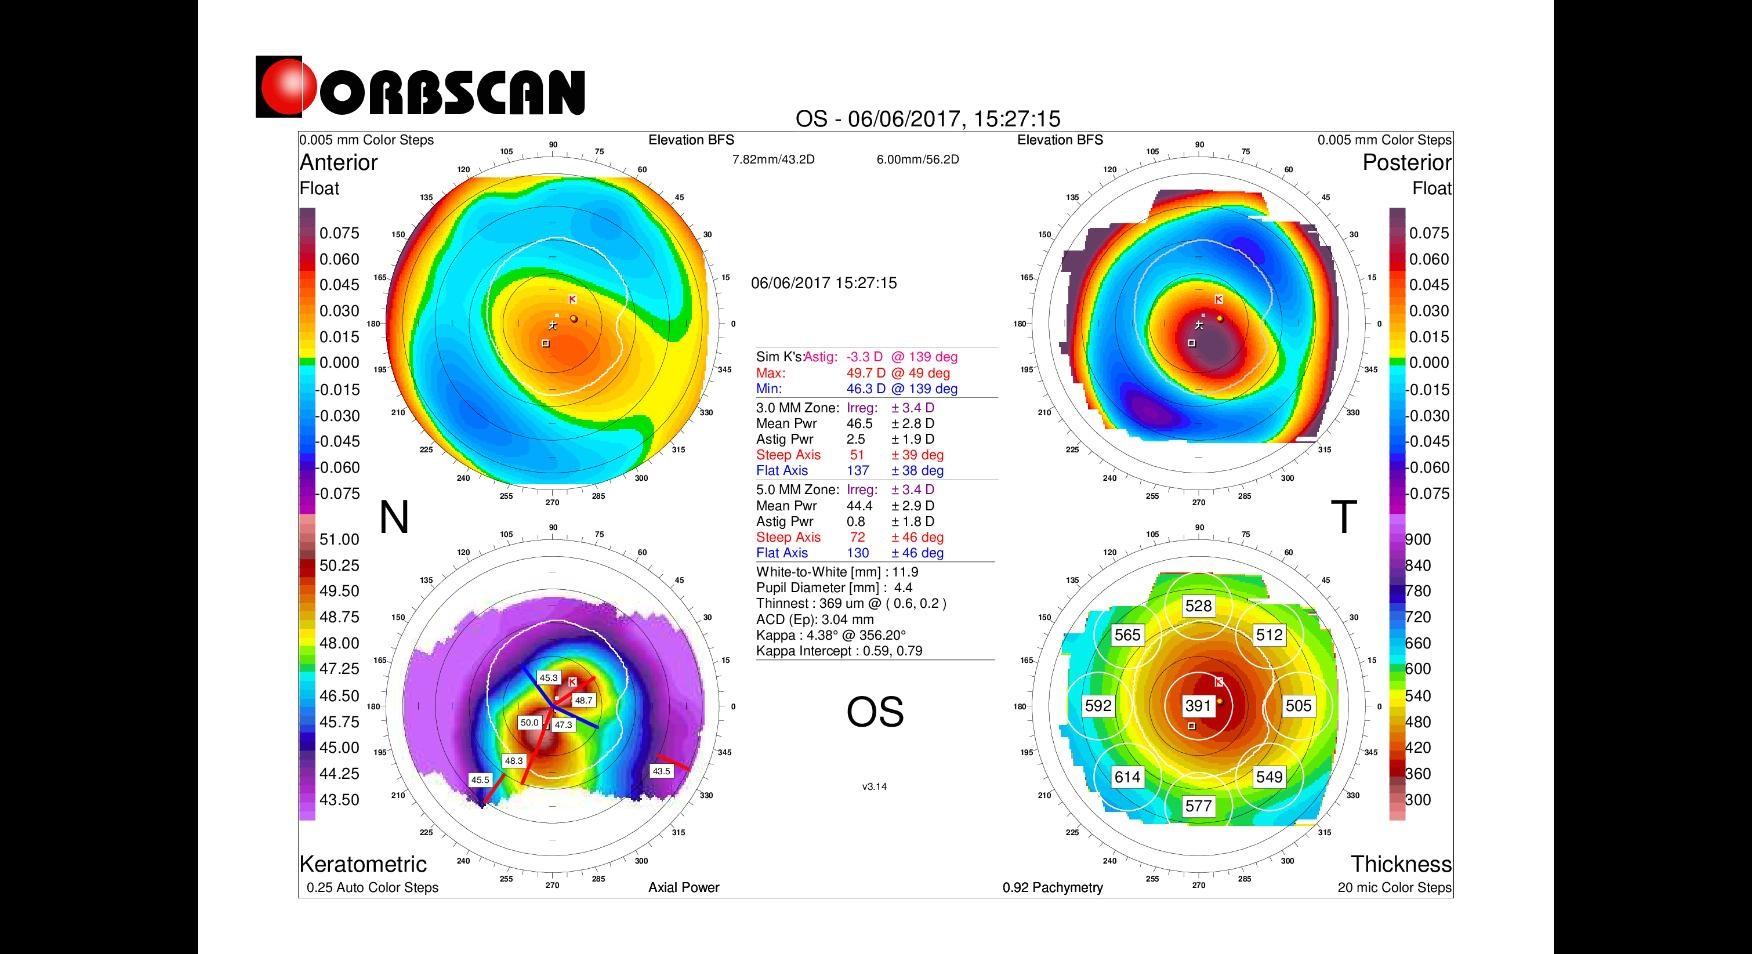 orbscan left eye keratoconus